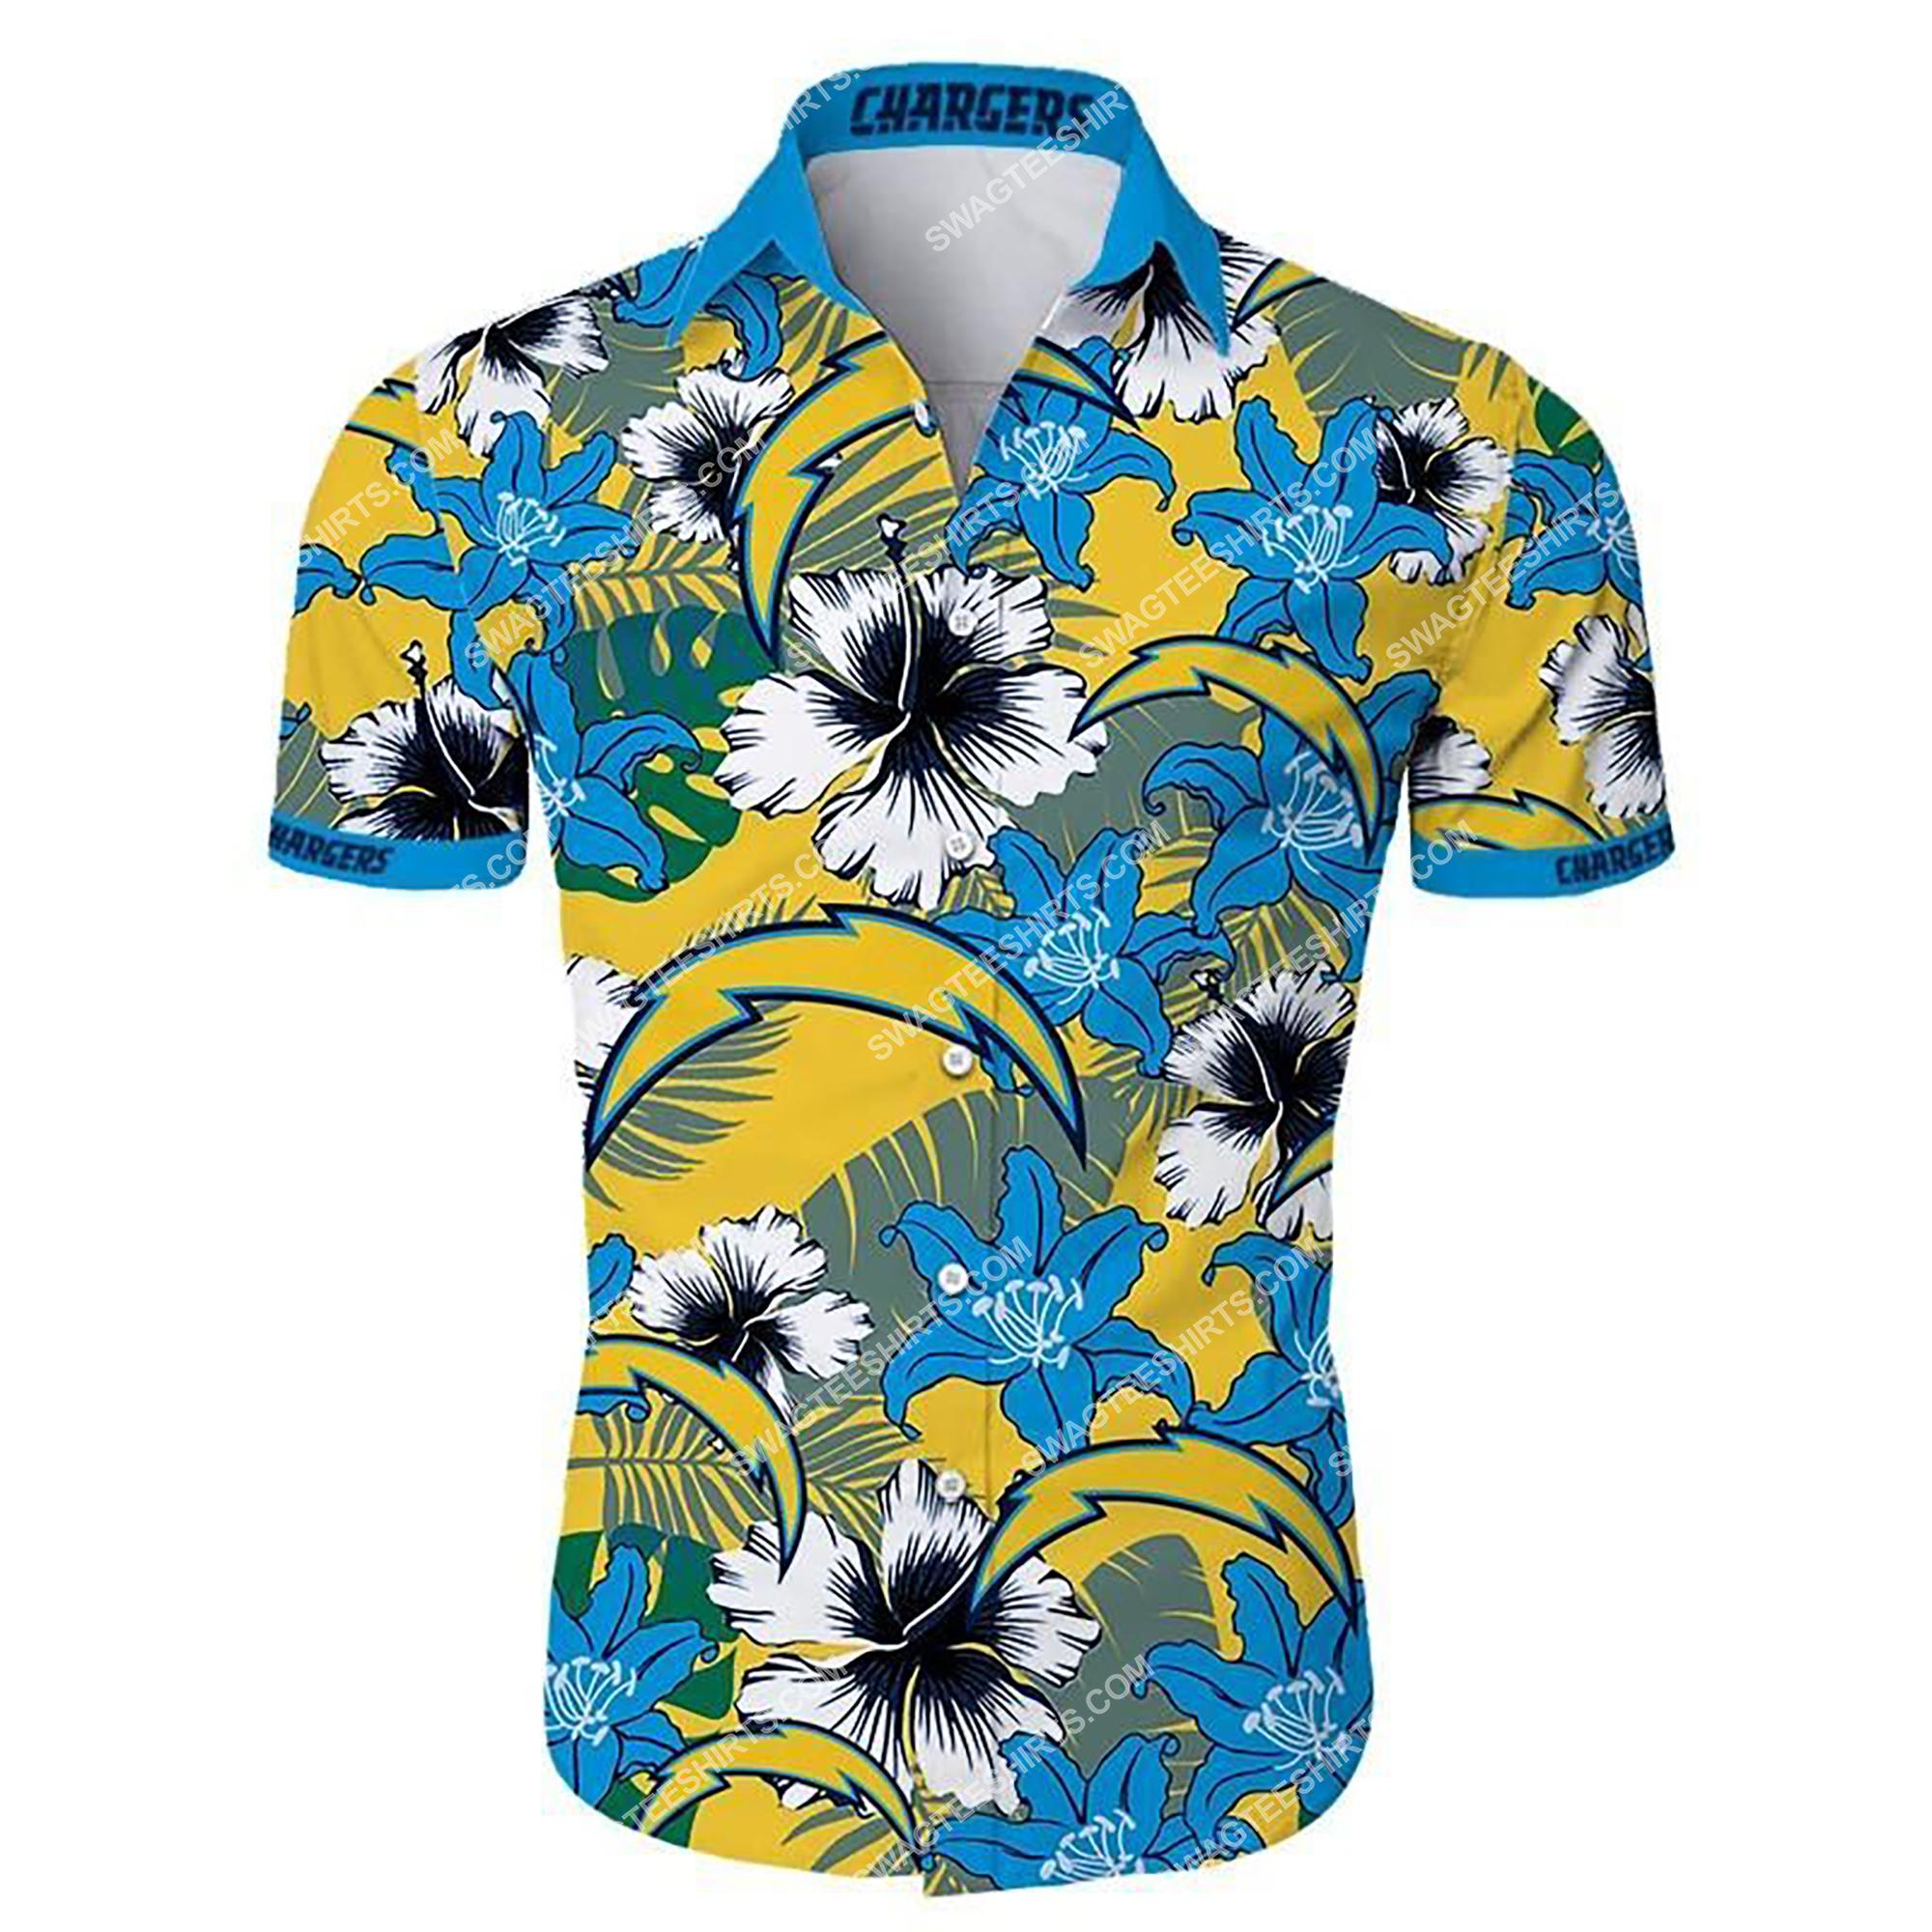 tropical flower los angeles chargers team summer hawaiian shirt 2 - Copy (3)